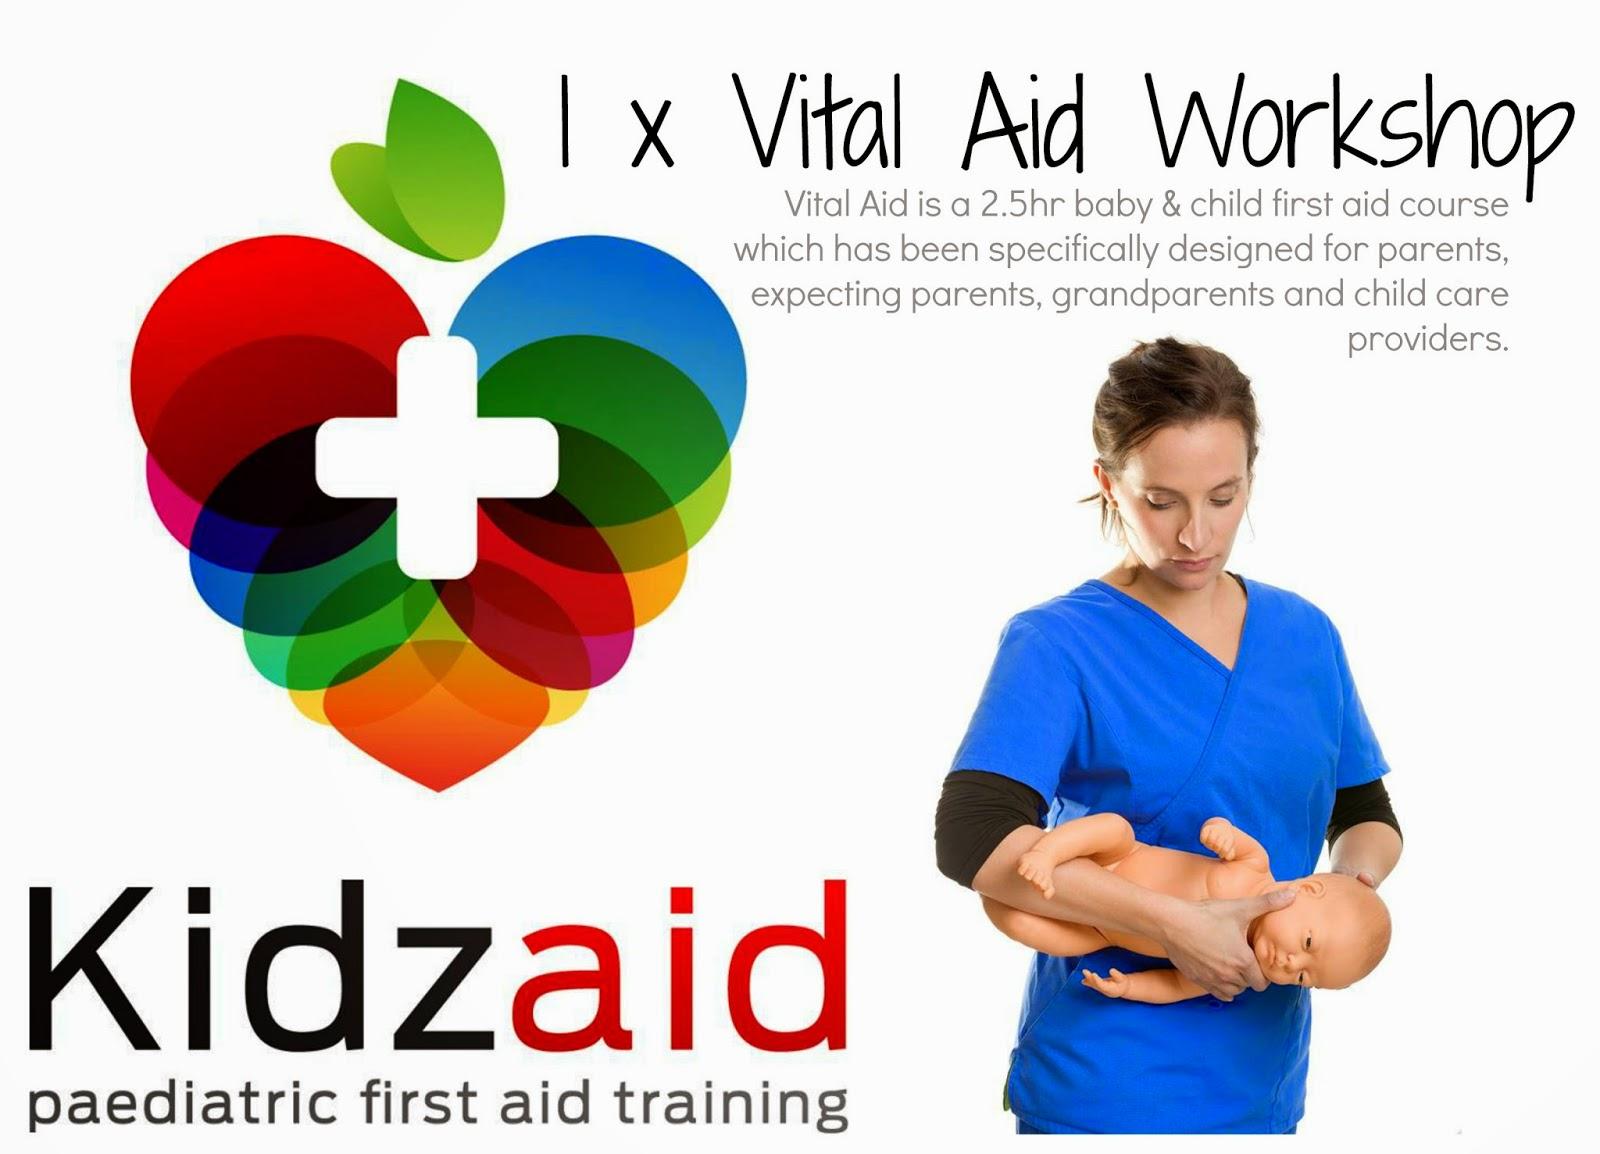 Kidzaid Australia vital aid workshop description for babies and kids